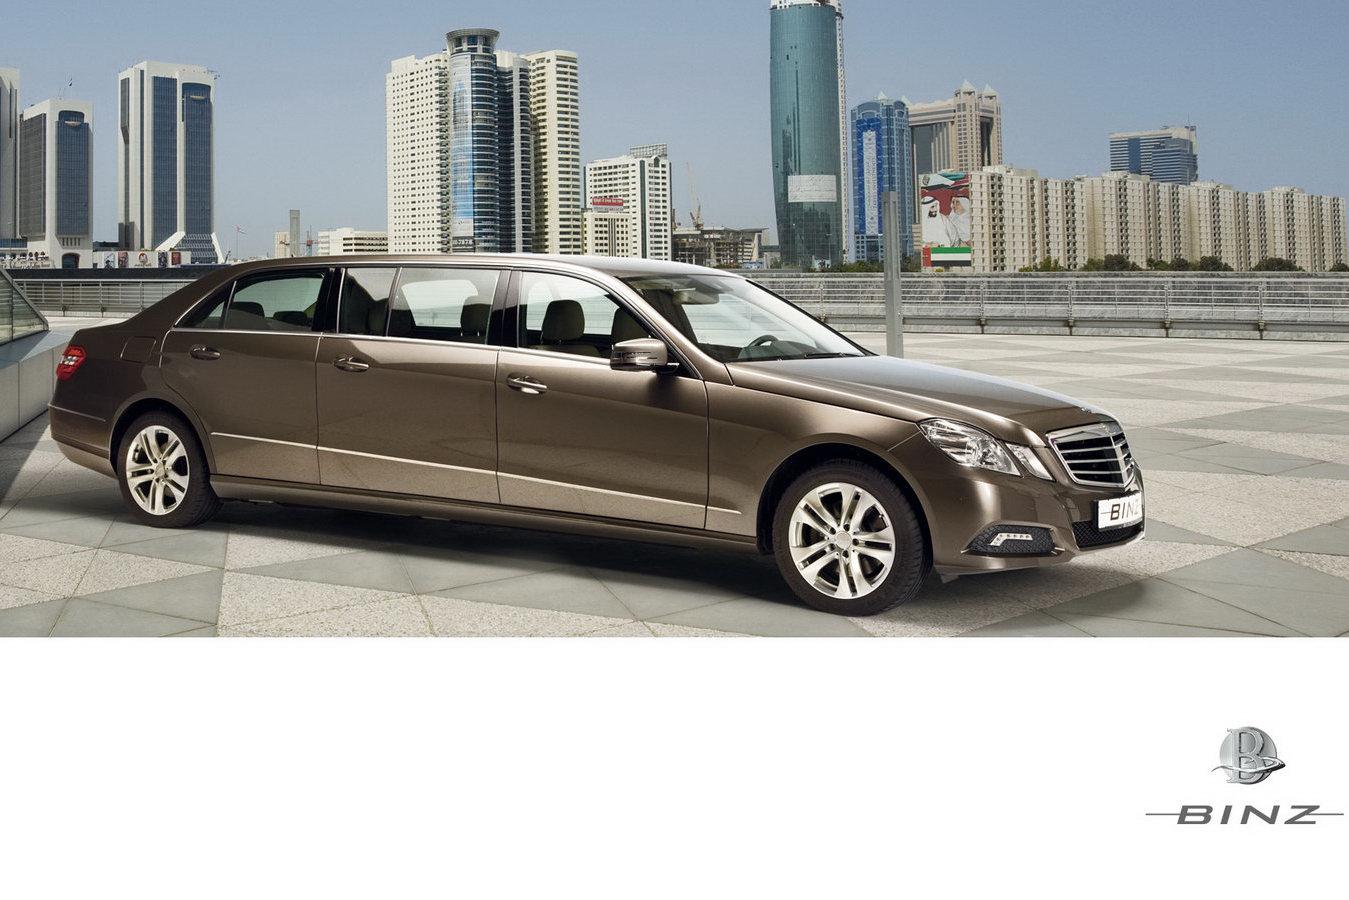 Binz debuts 6 door 2010 mercedes benz e class limo carscoops for Mercedes benz limousine price